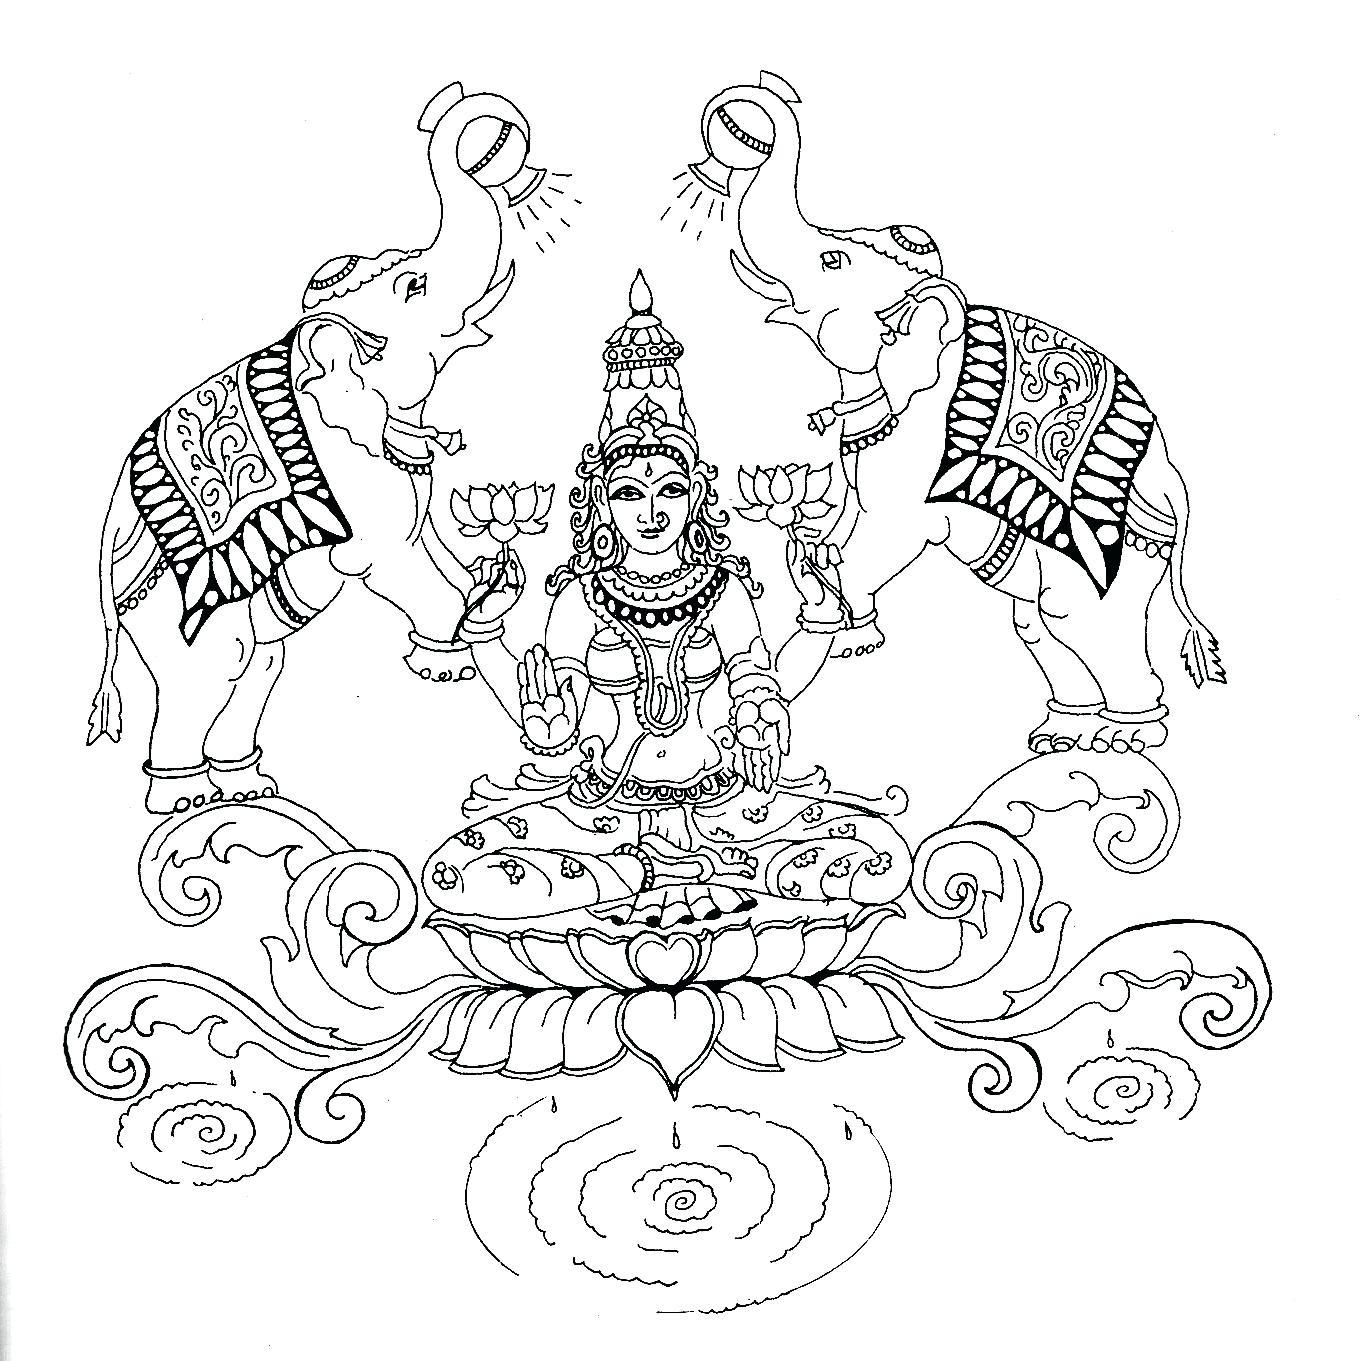 Saraswati Drawing at GetDrawings.com | Free for personal use ...